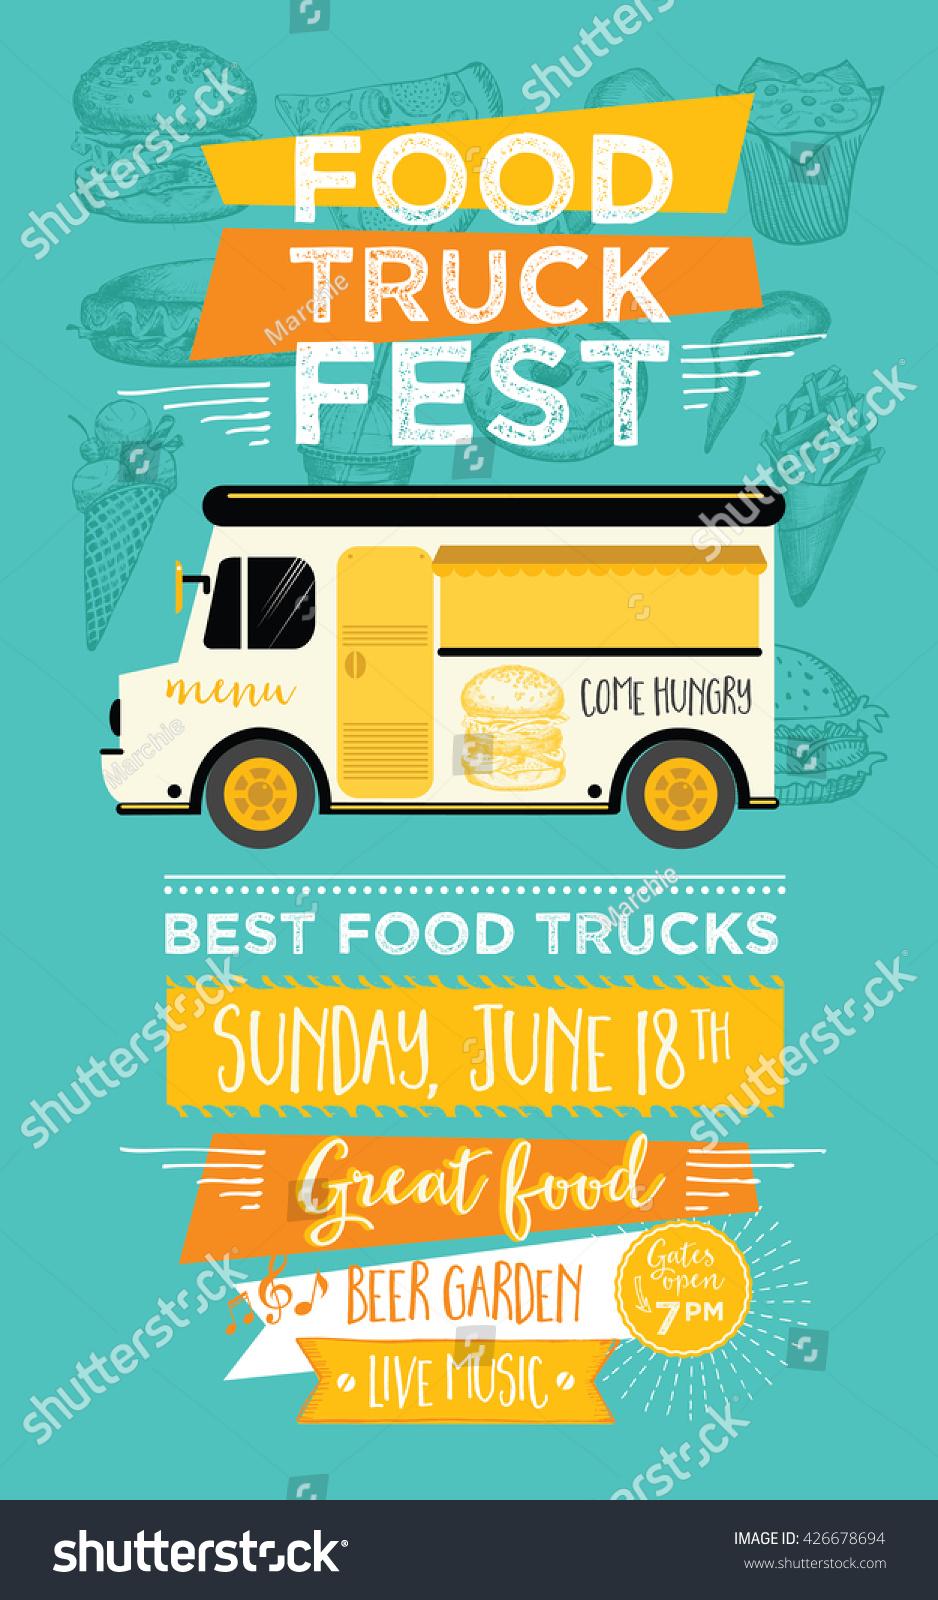 Food truck festival menu food brochure street food for Food truck menu design